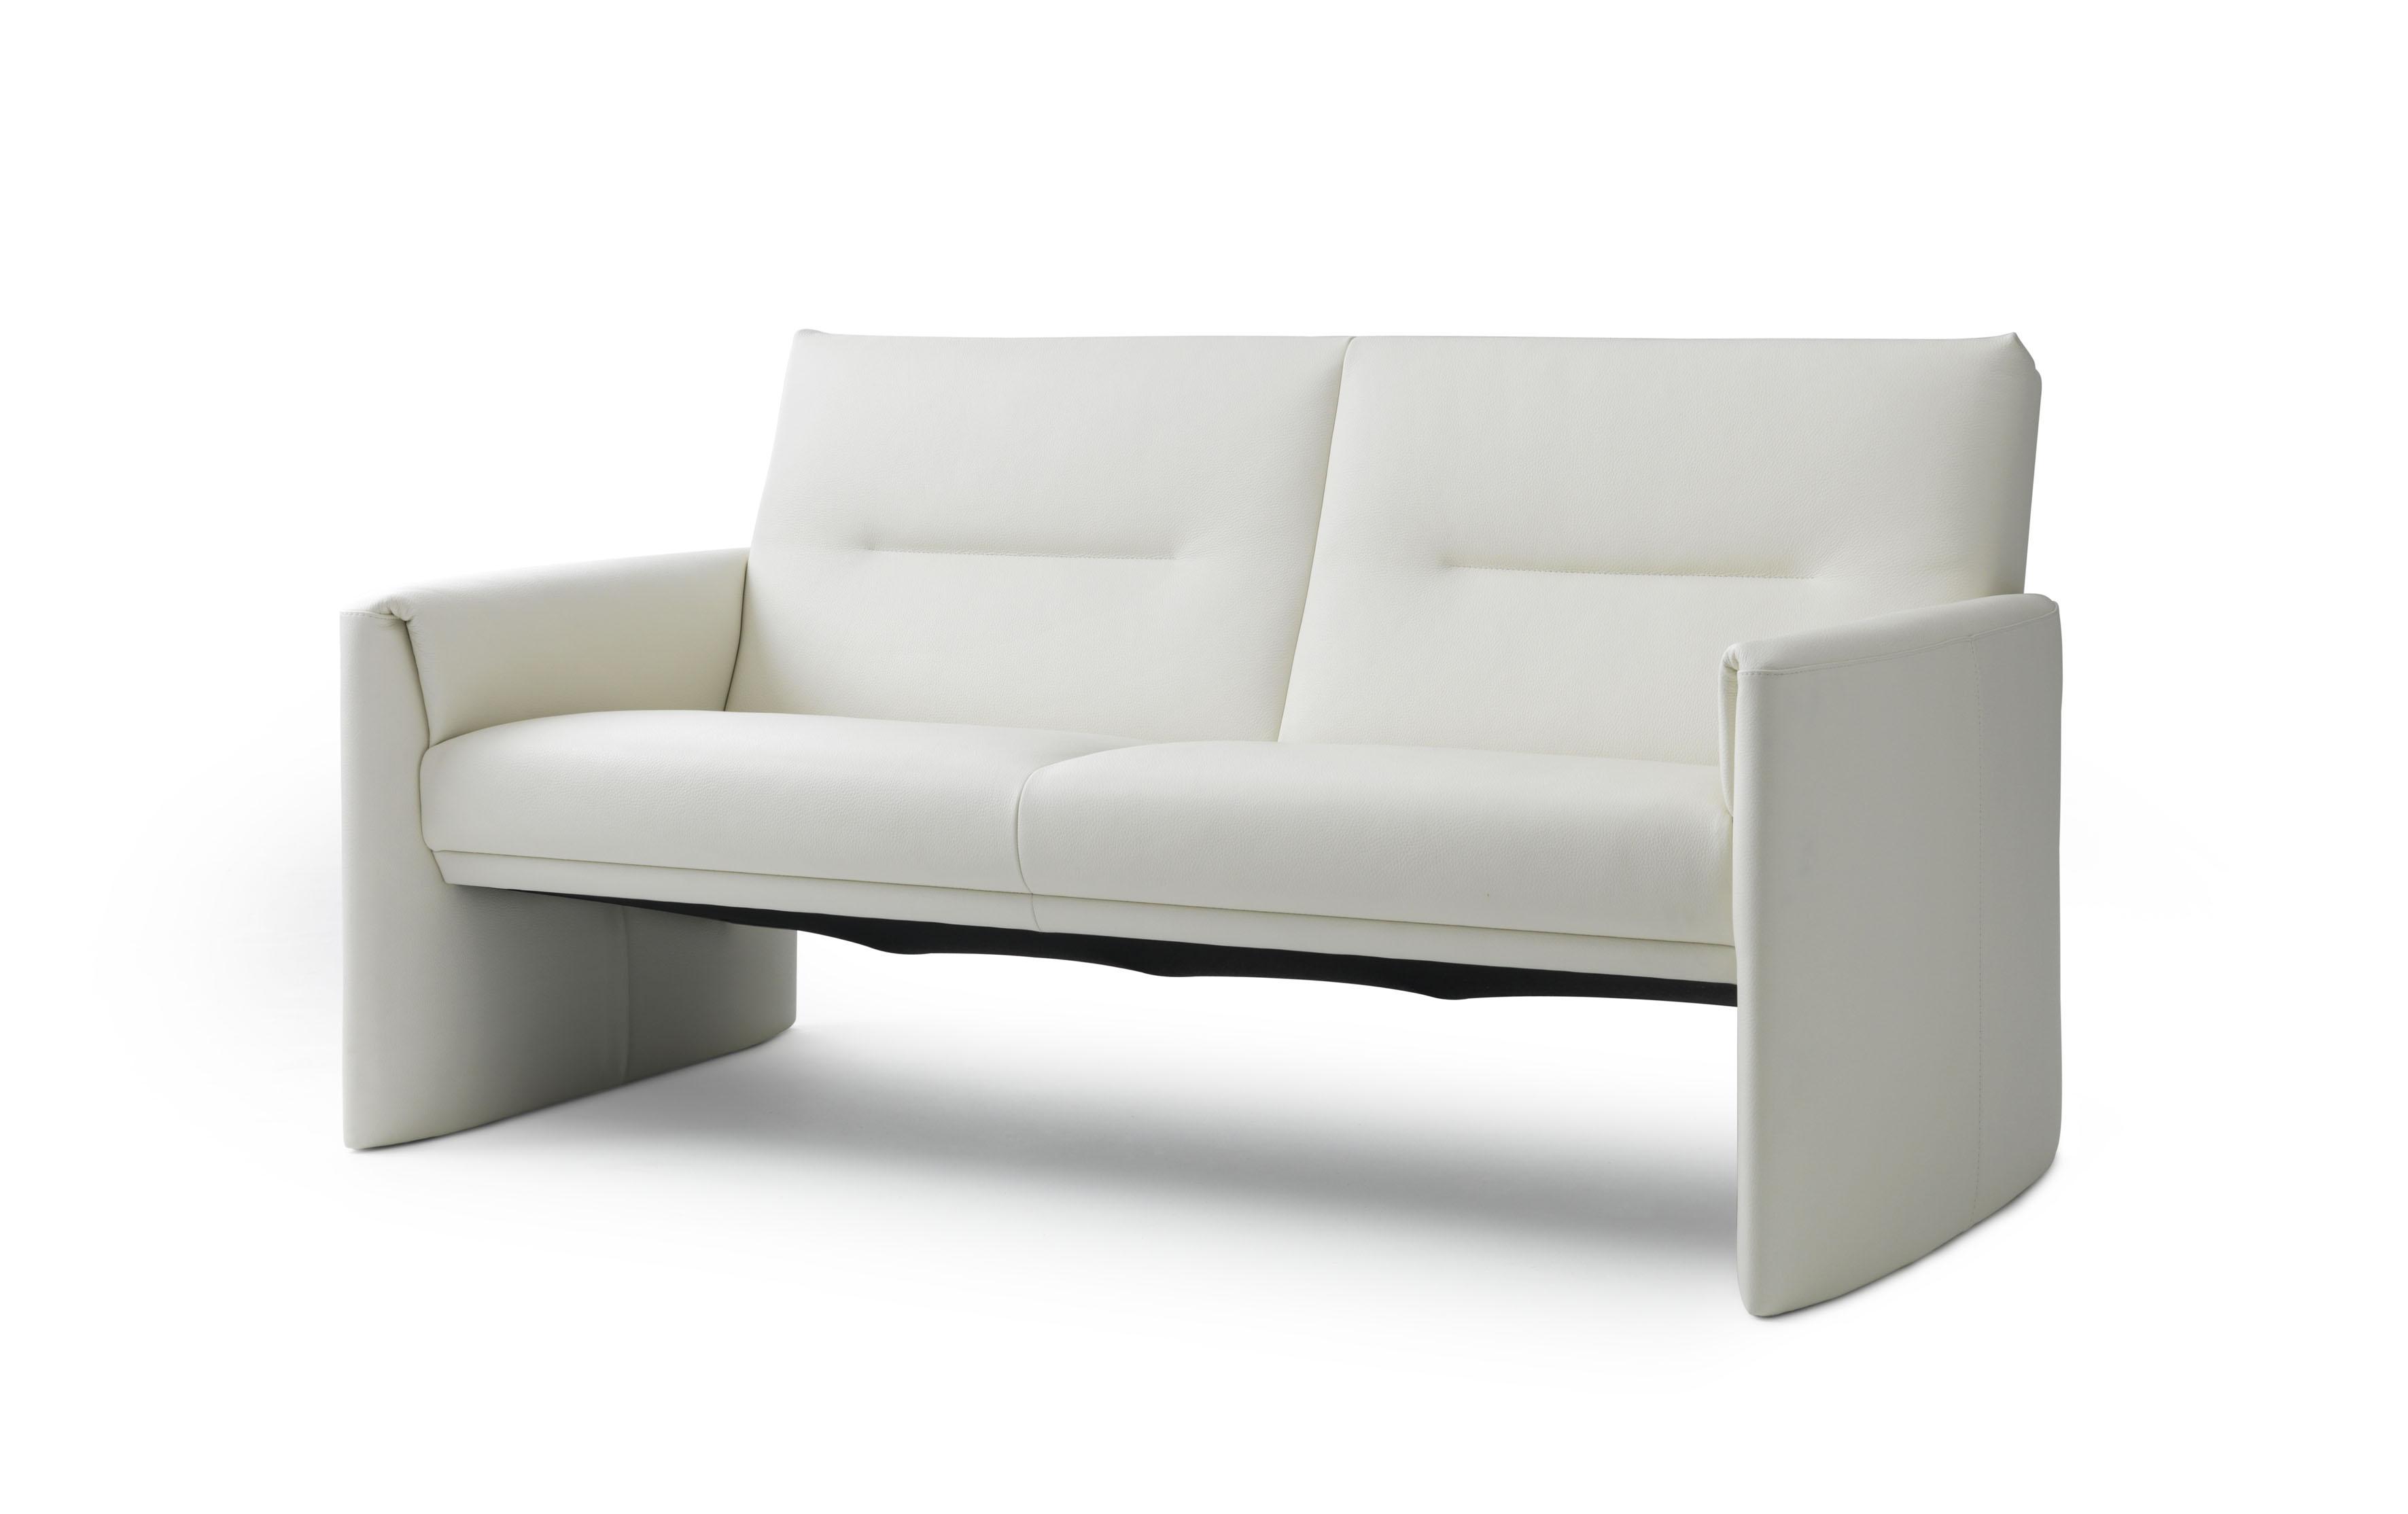 Leolux boavista zits bank hoog leolux meubelen specialist